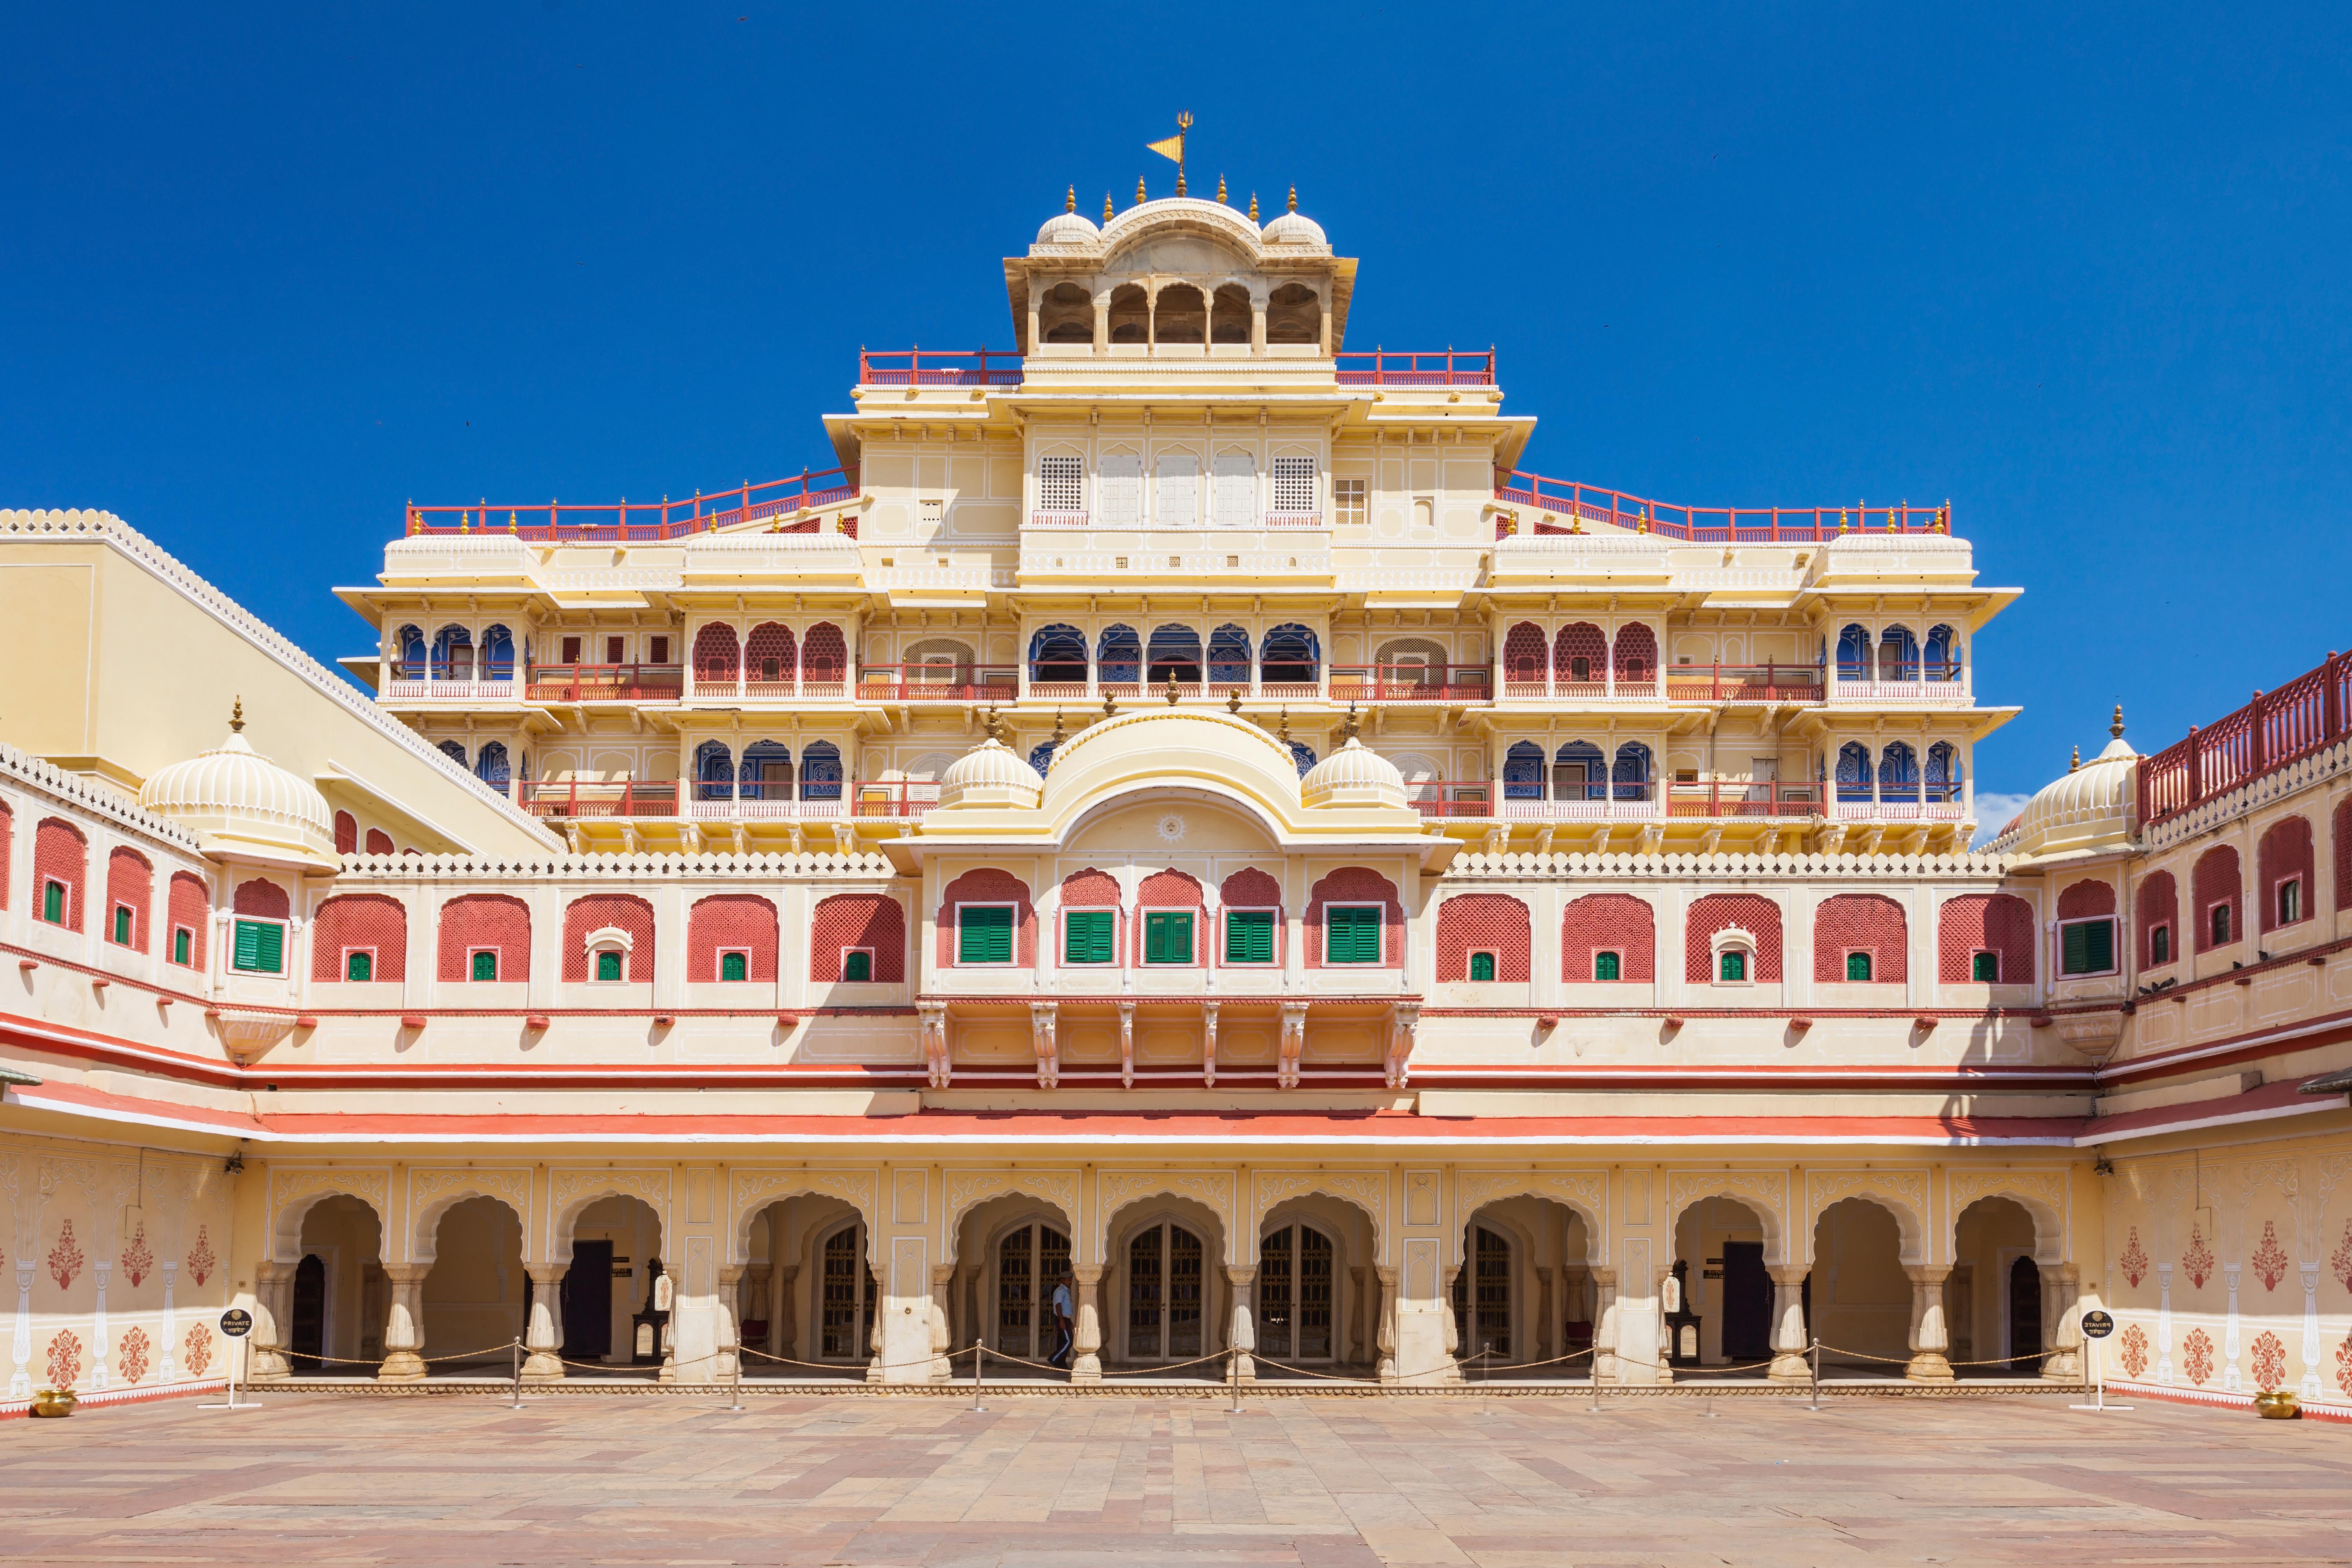 Chandra Mahal Palace (City Palace) in Jaipur, India_shutterstock_197619596